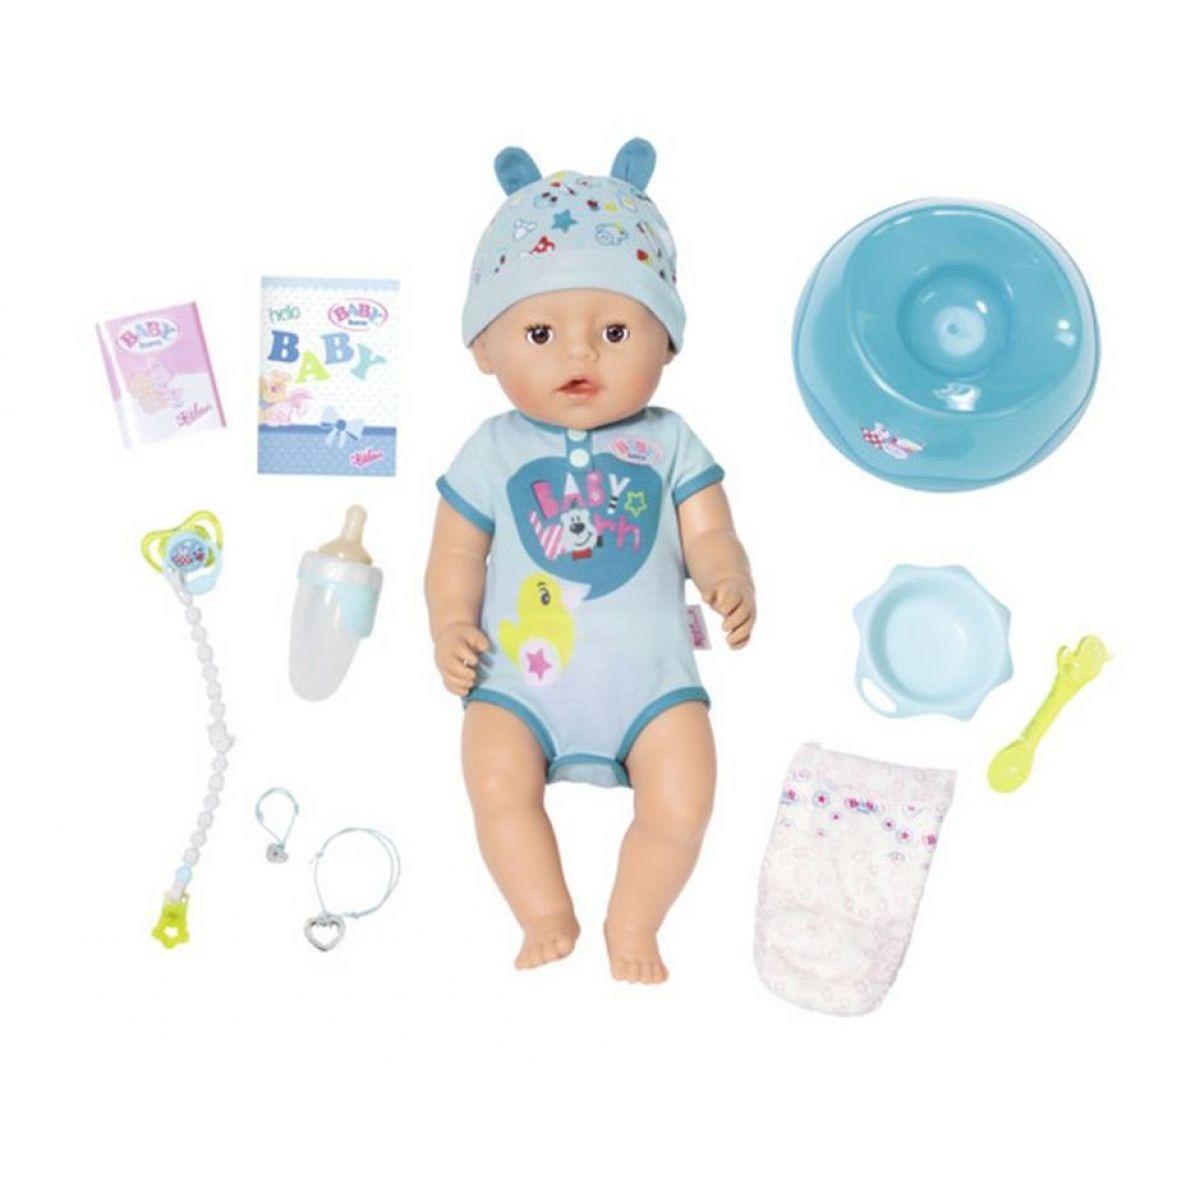 Baby Born Soft Touch chlapeček